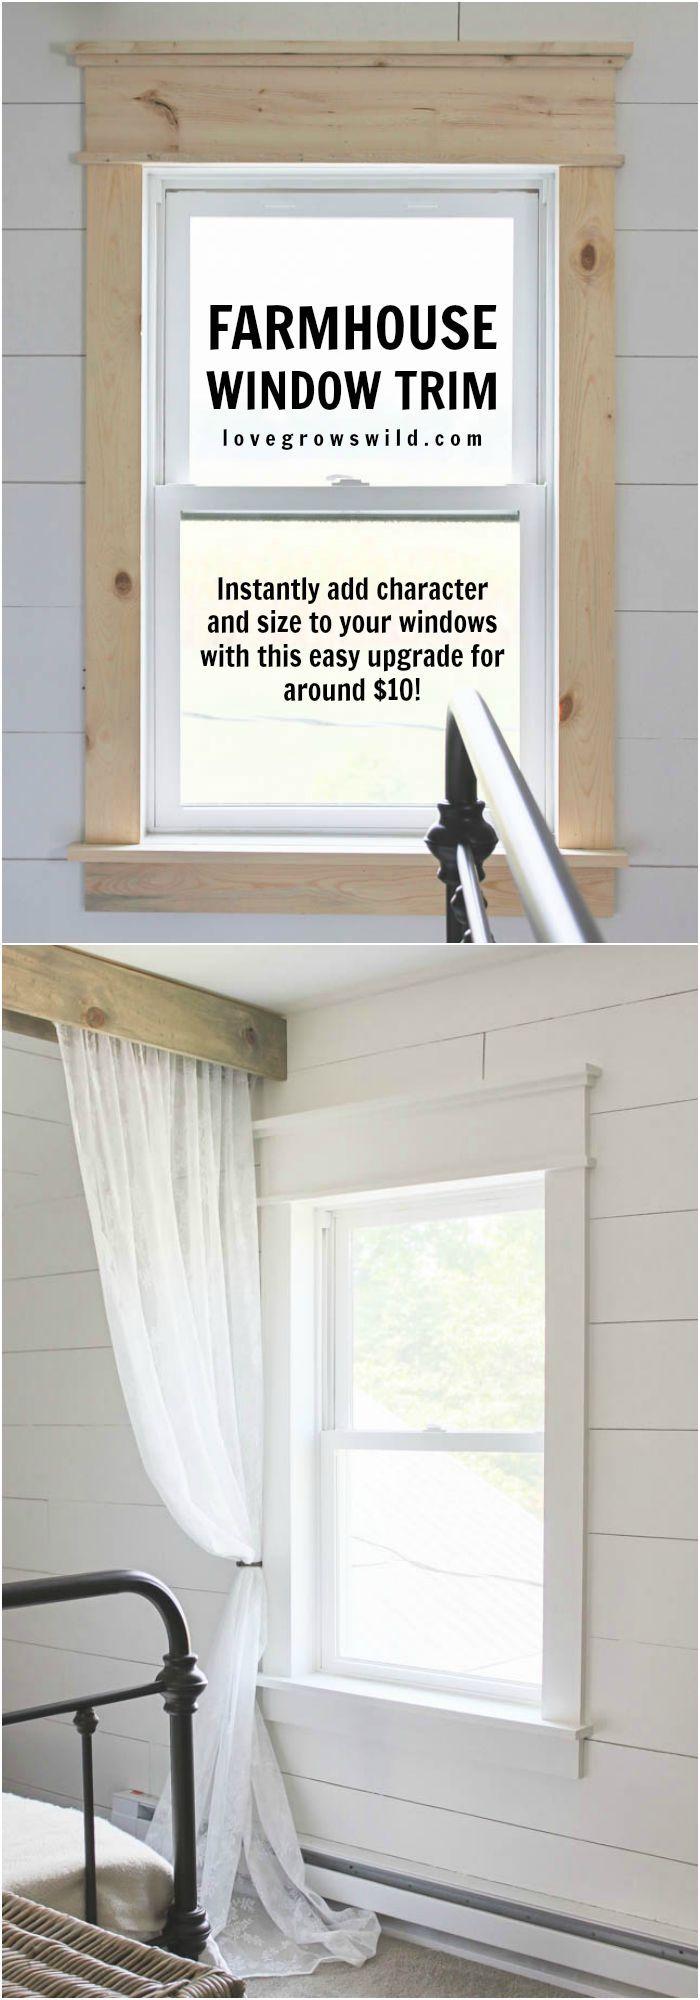 Window cover up ideas  farmhouse window trim  new home ideas  pinterest  casas hogar